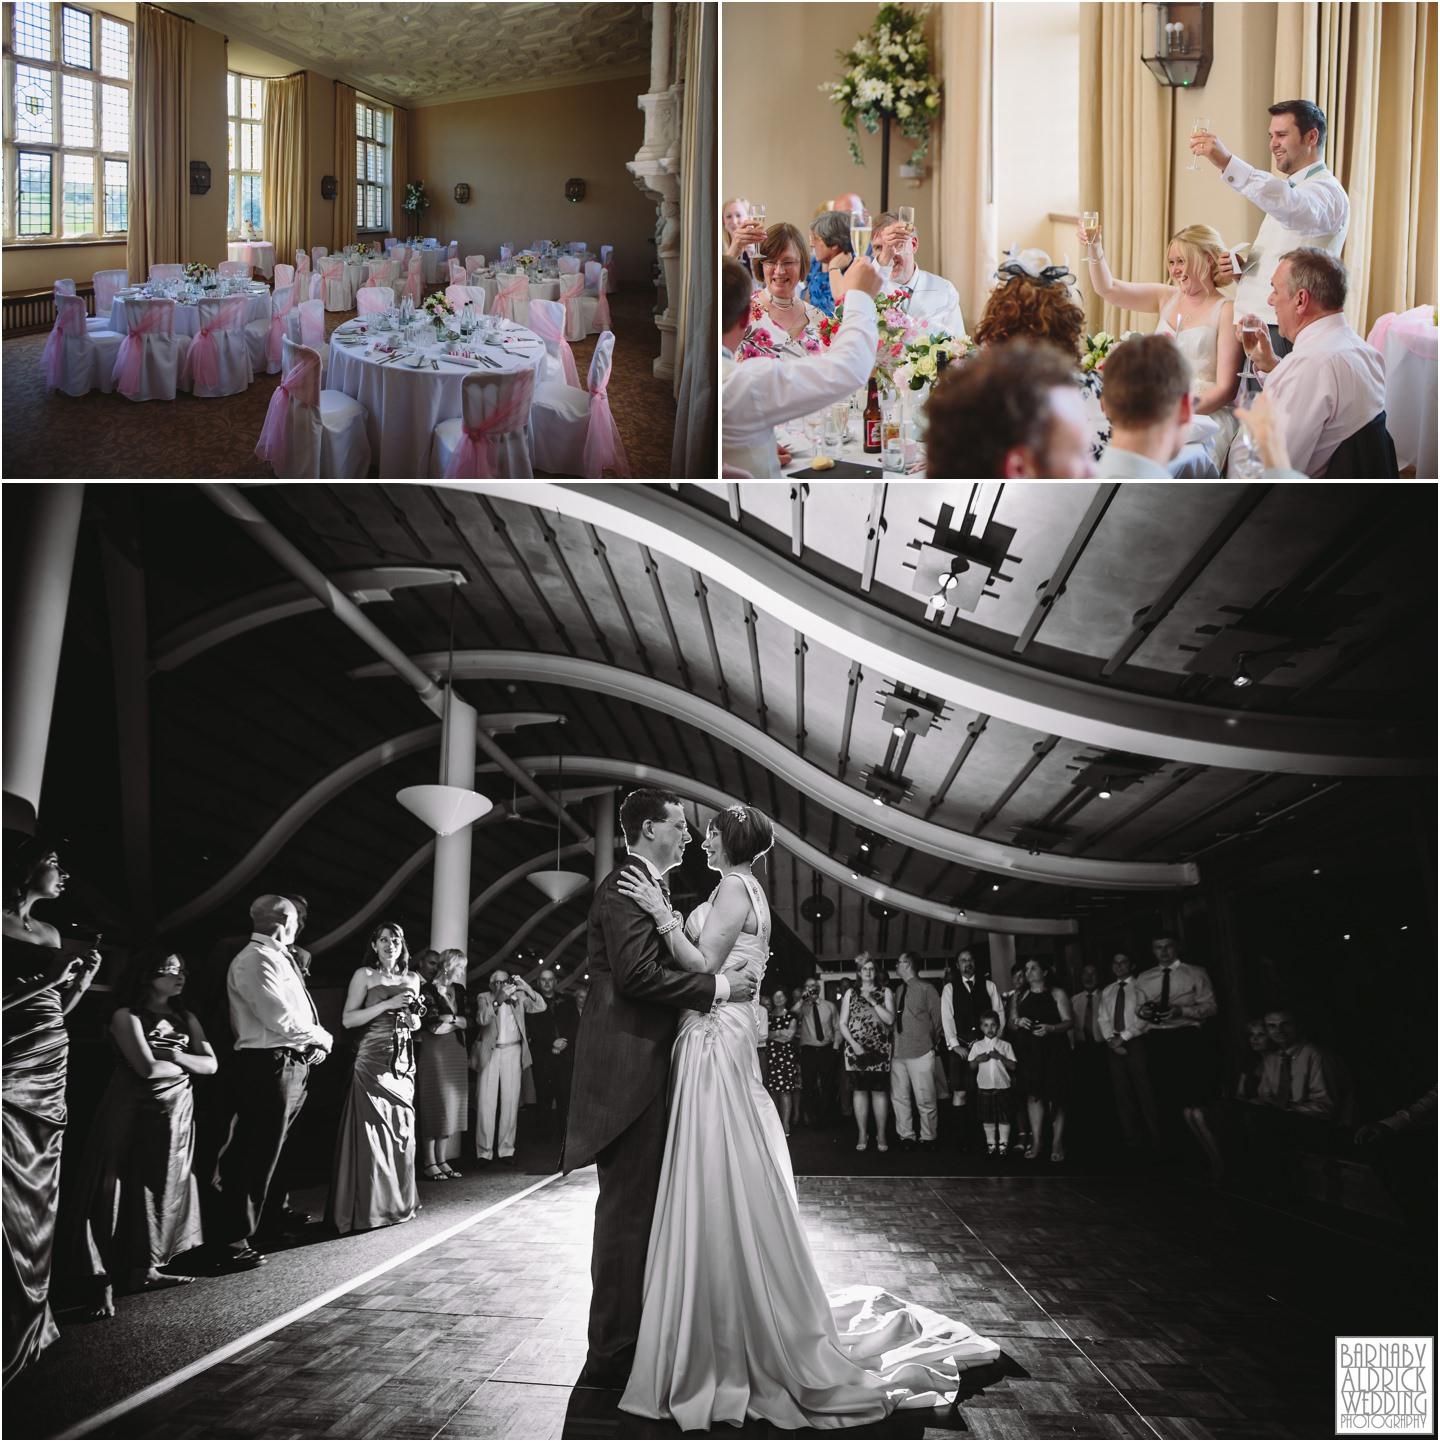 Fountains-Abbey-evening-reception-Wedding-Photographer-Ripon-Yorkshire